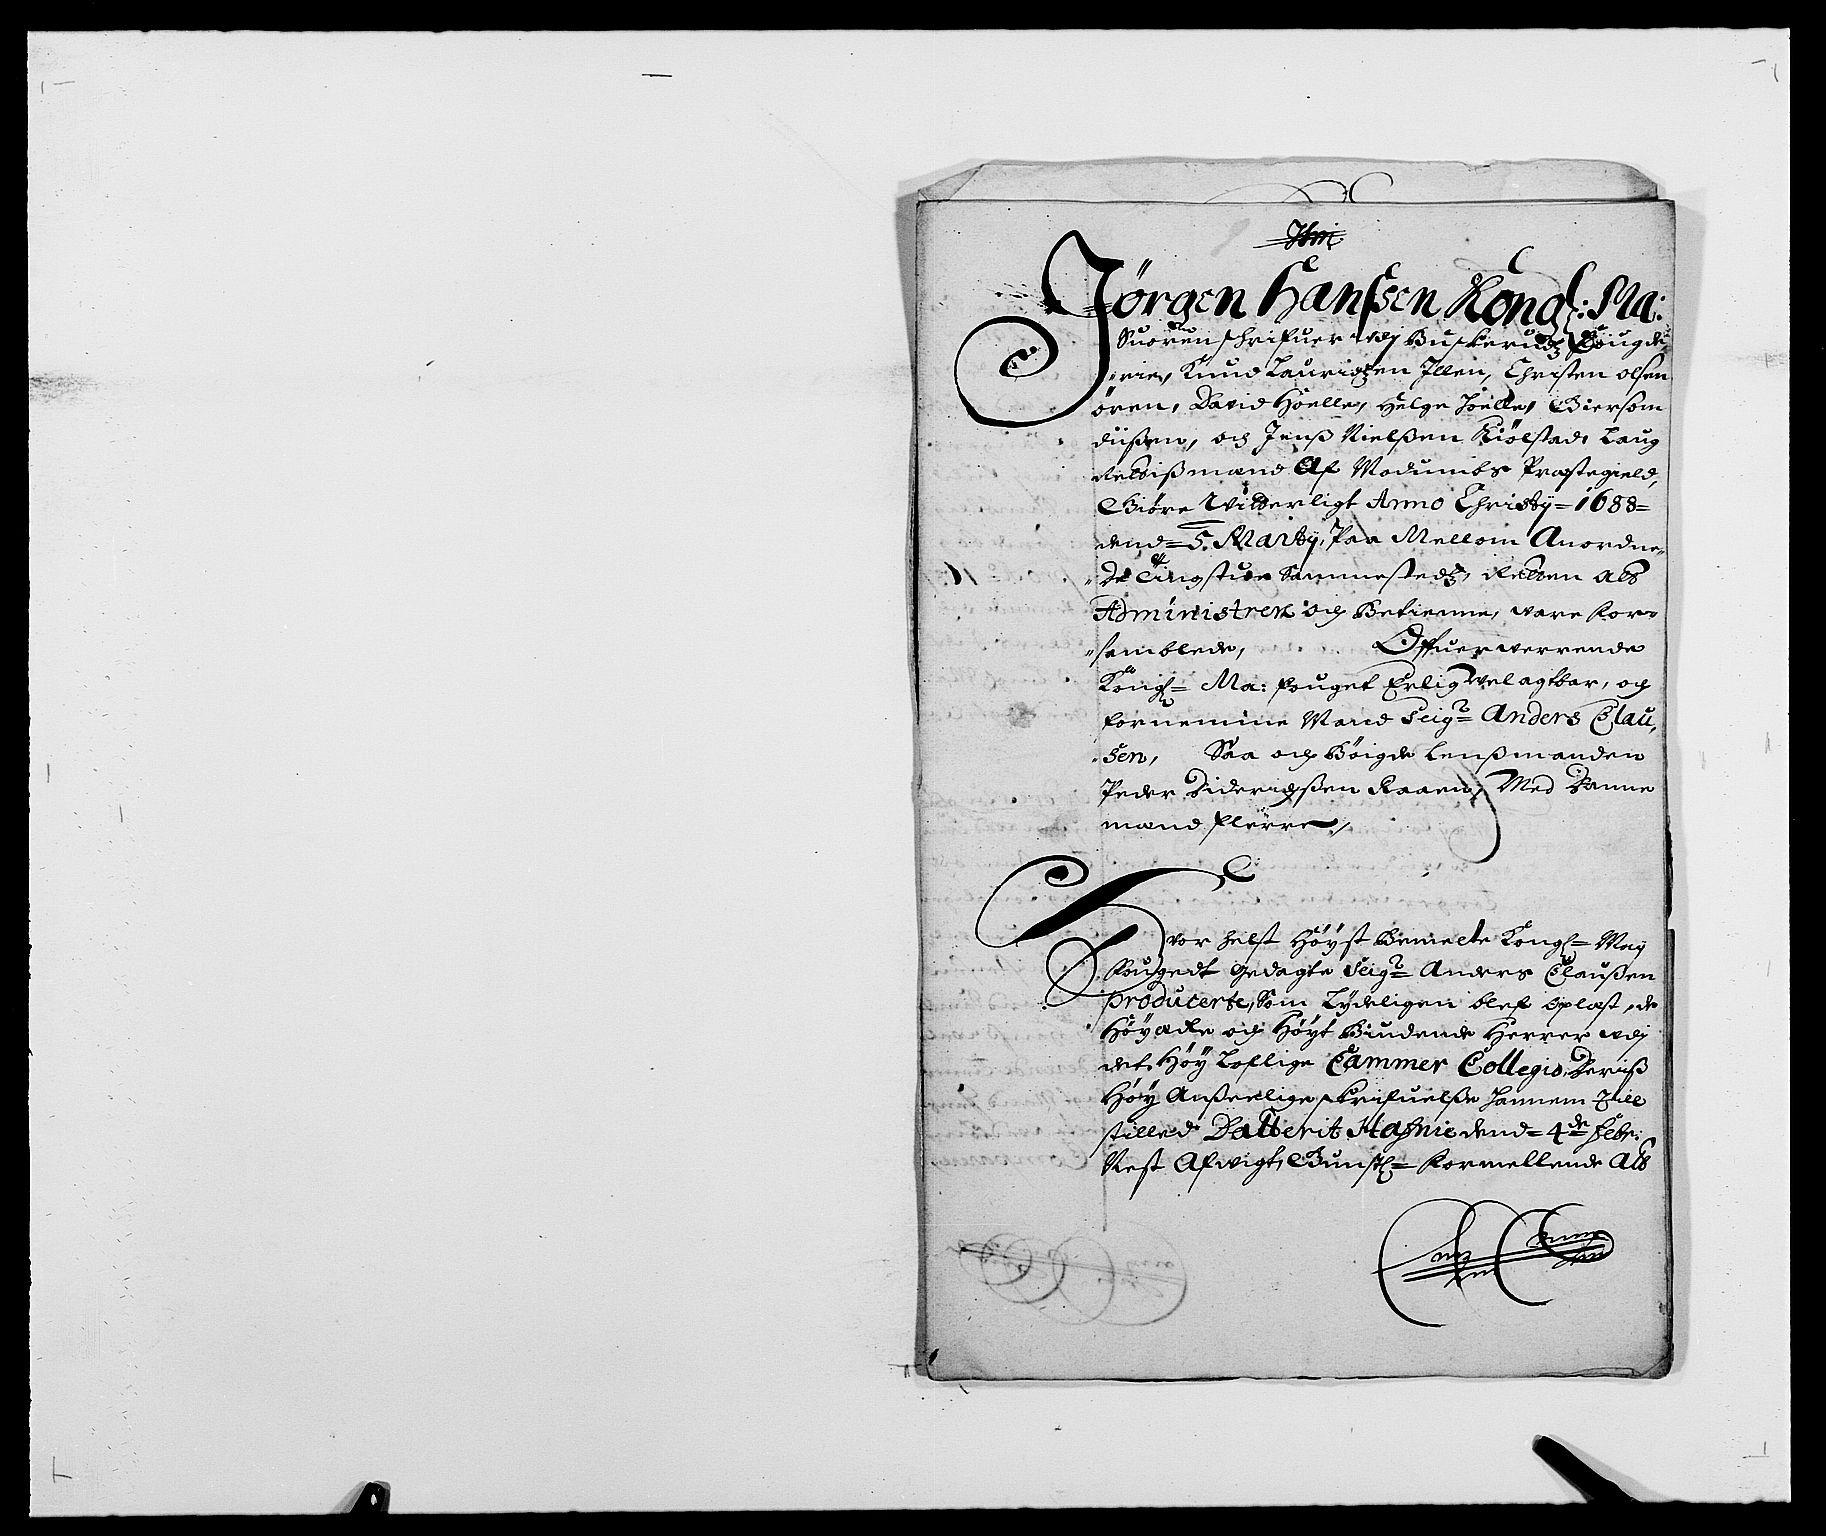 RA, Rentekammeret inntil 1814, Reviderte regnskaper, Fogderegnskap, R25/L1679: Fogderegnskap Buskerud, 1687-1688, s. 524